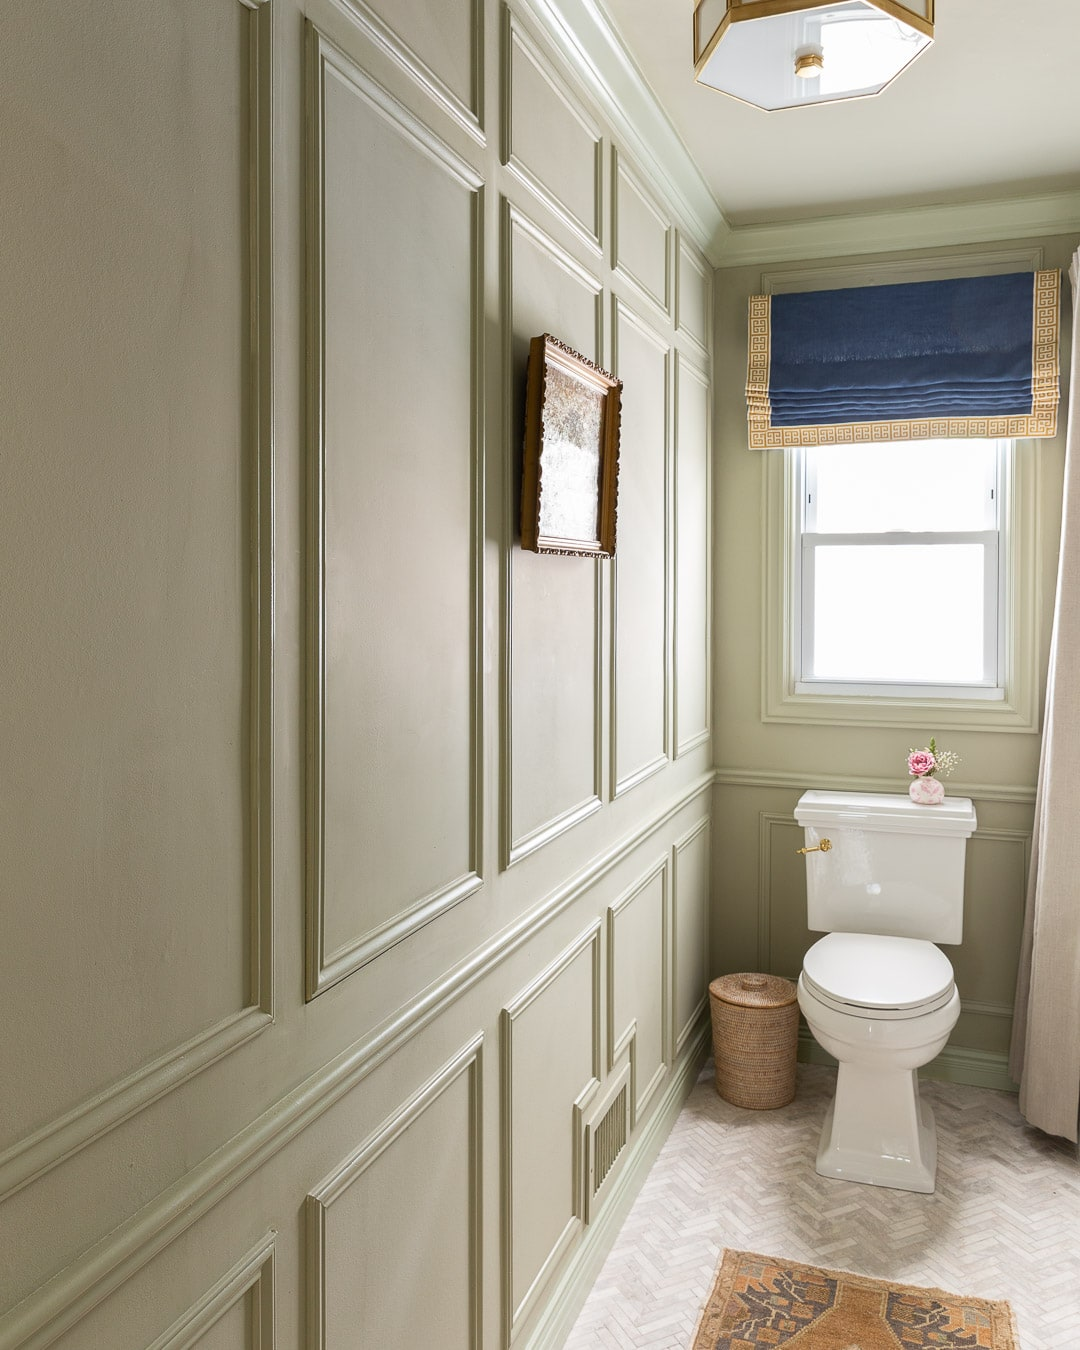 bathroom-molding-modern-traditional-farrow-ball-french-gray